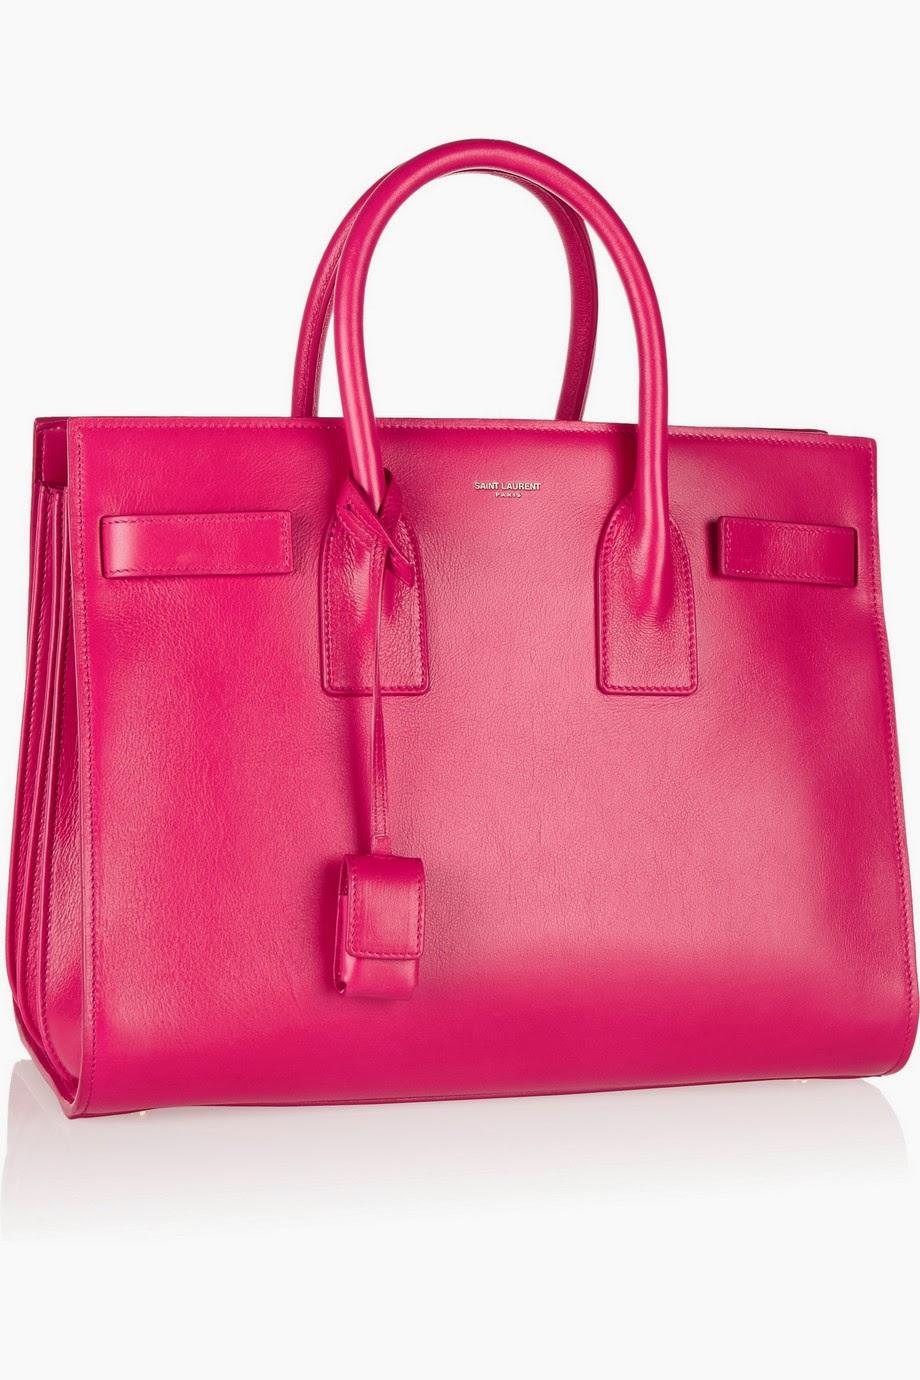 Chanel сумки копии на таобао